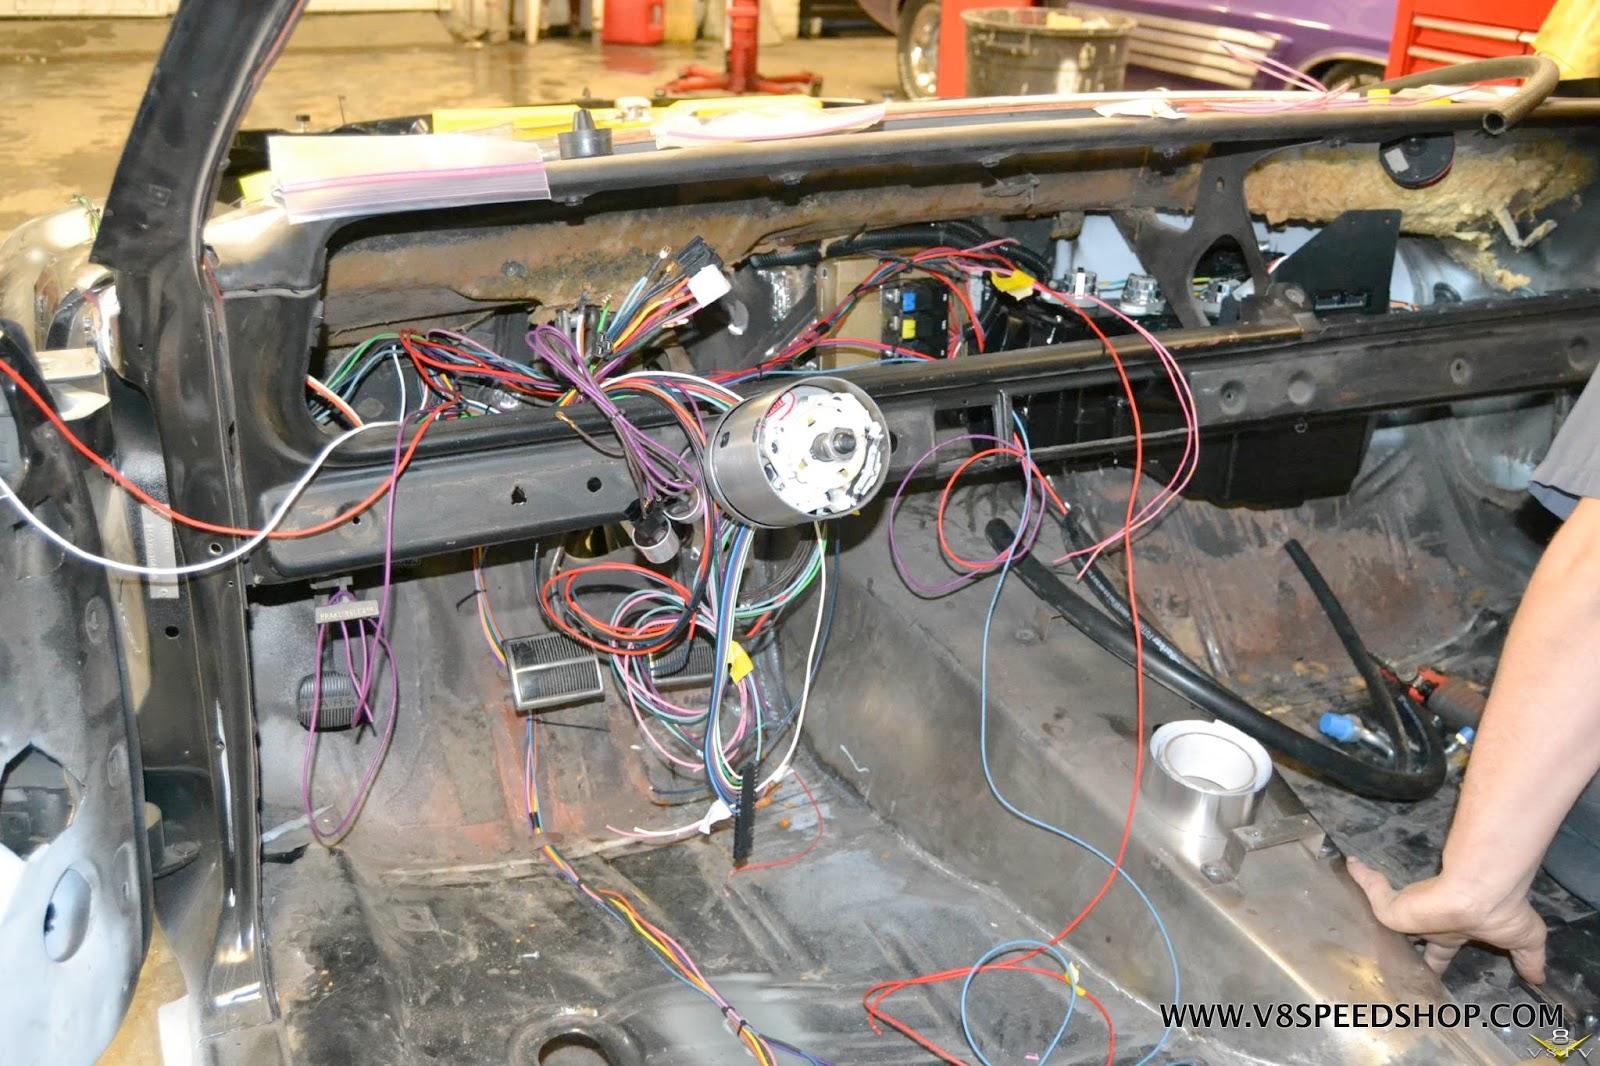 1965 Chevrolet Impala SS Restoration 6 0 LS, 6-Speed